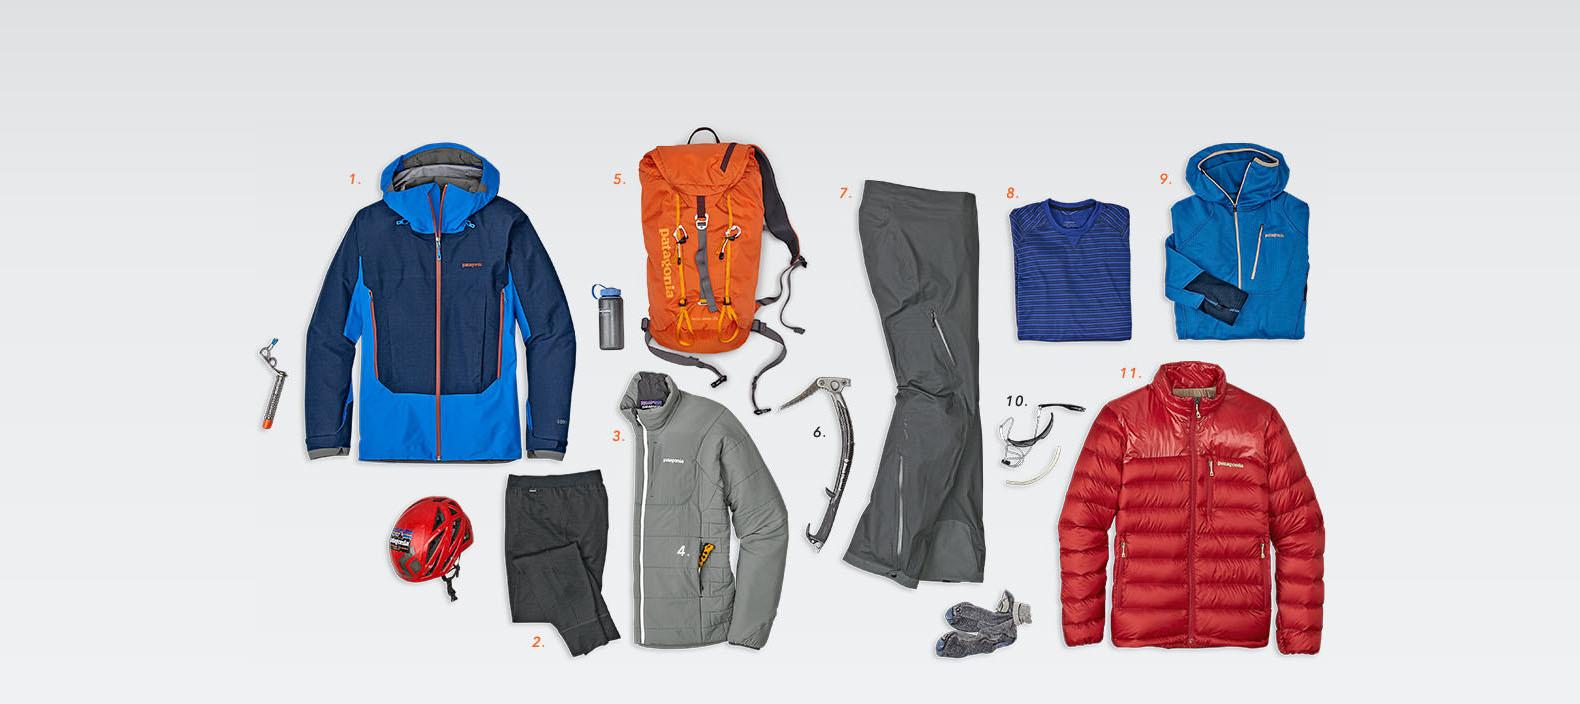 Horolezecká výbava vo Fitz traverz, ktorý použil Tommy Cladwell